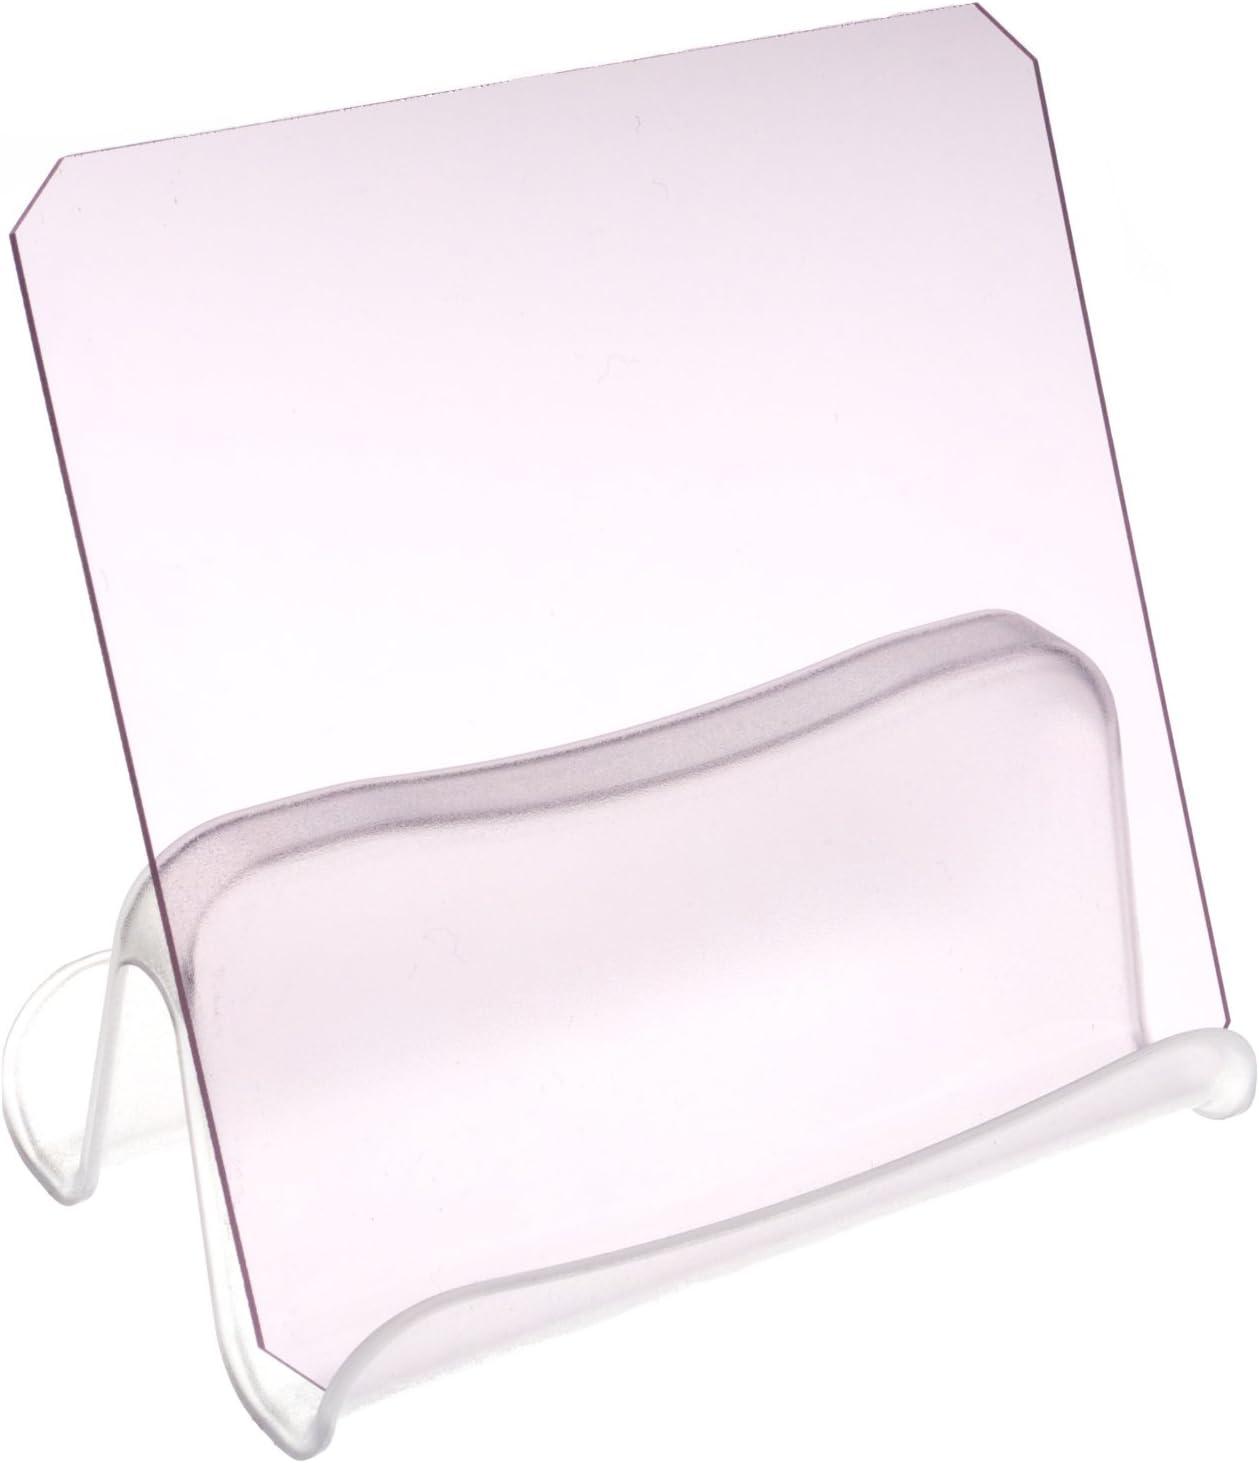 4x4 Formatt-Hitech 100x100mm Resin UV 2B